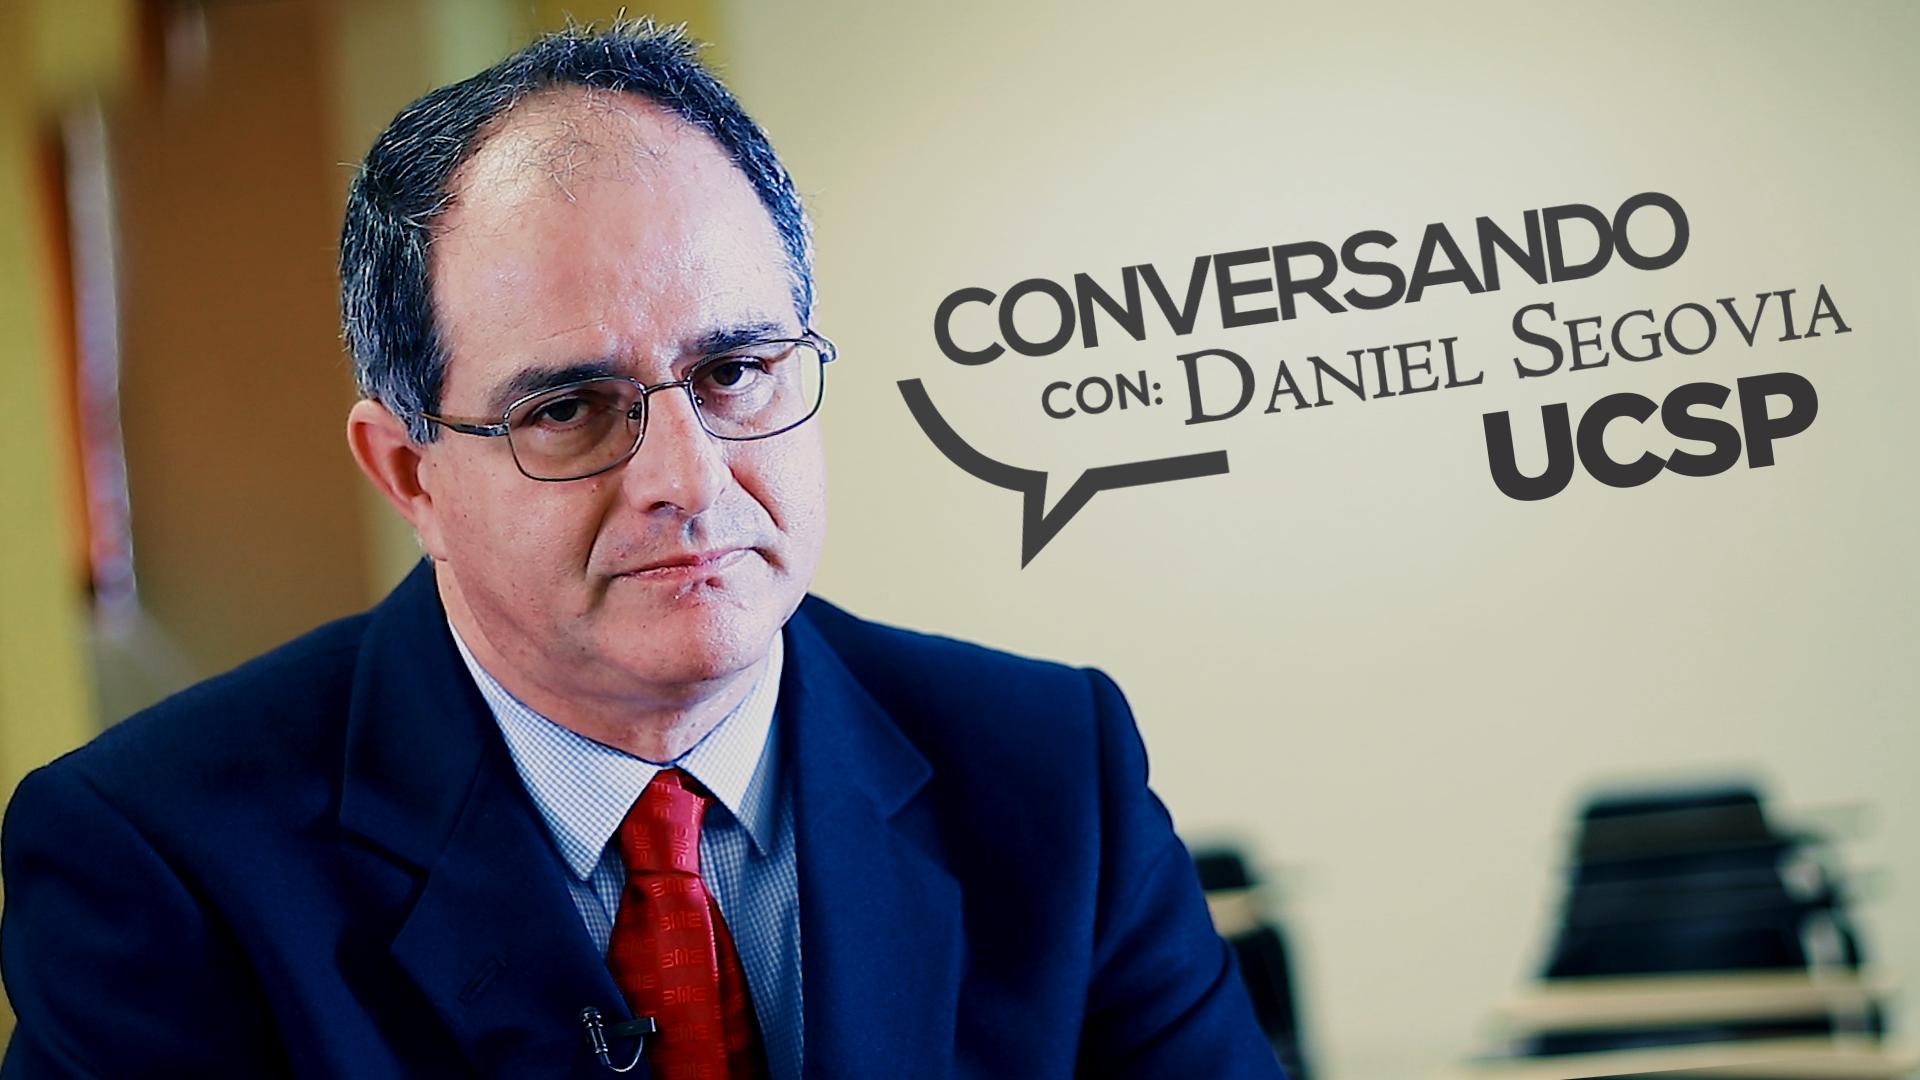 Conversando con Daniel Segovia